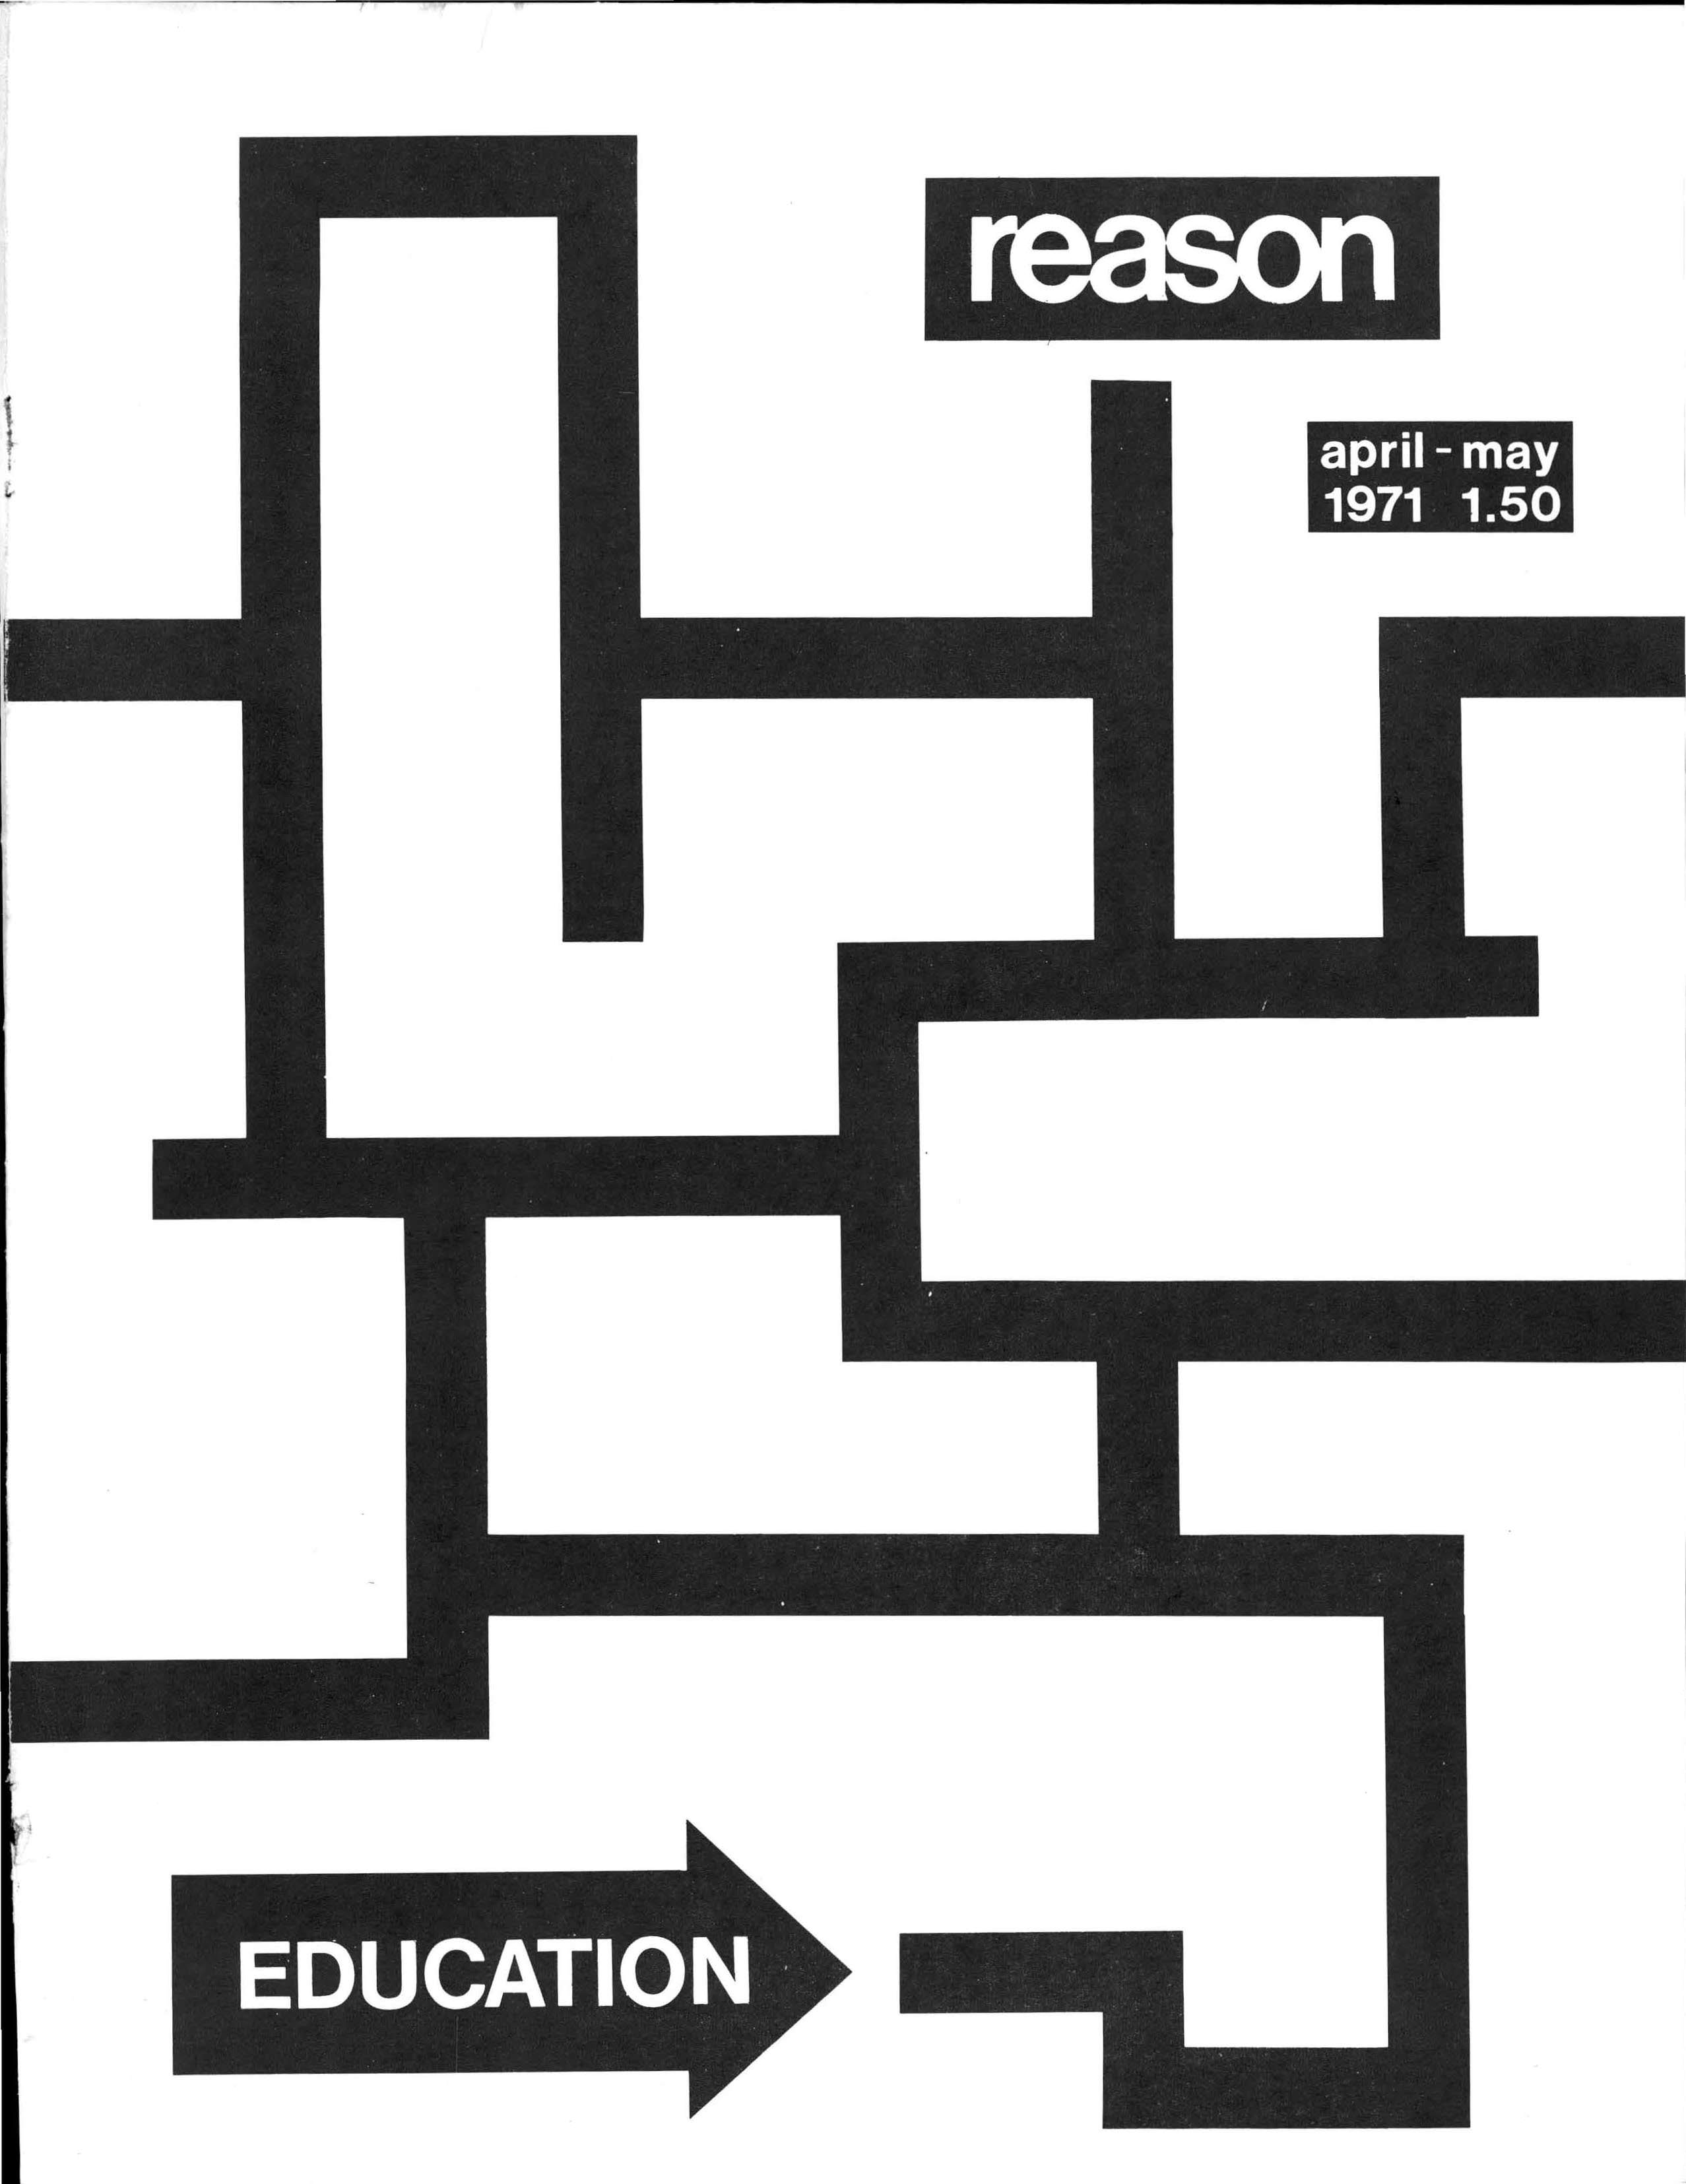 Reason Magazine, April 1971 cover image